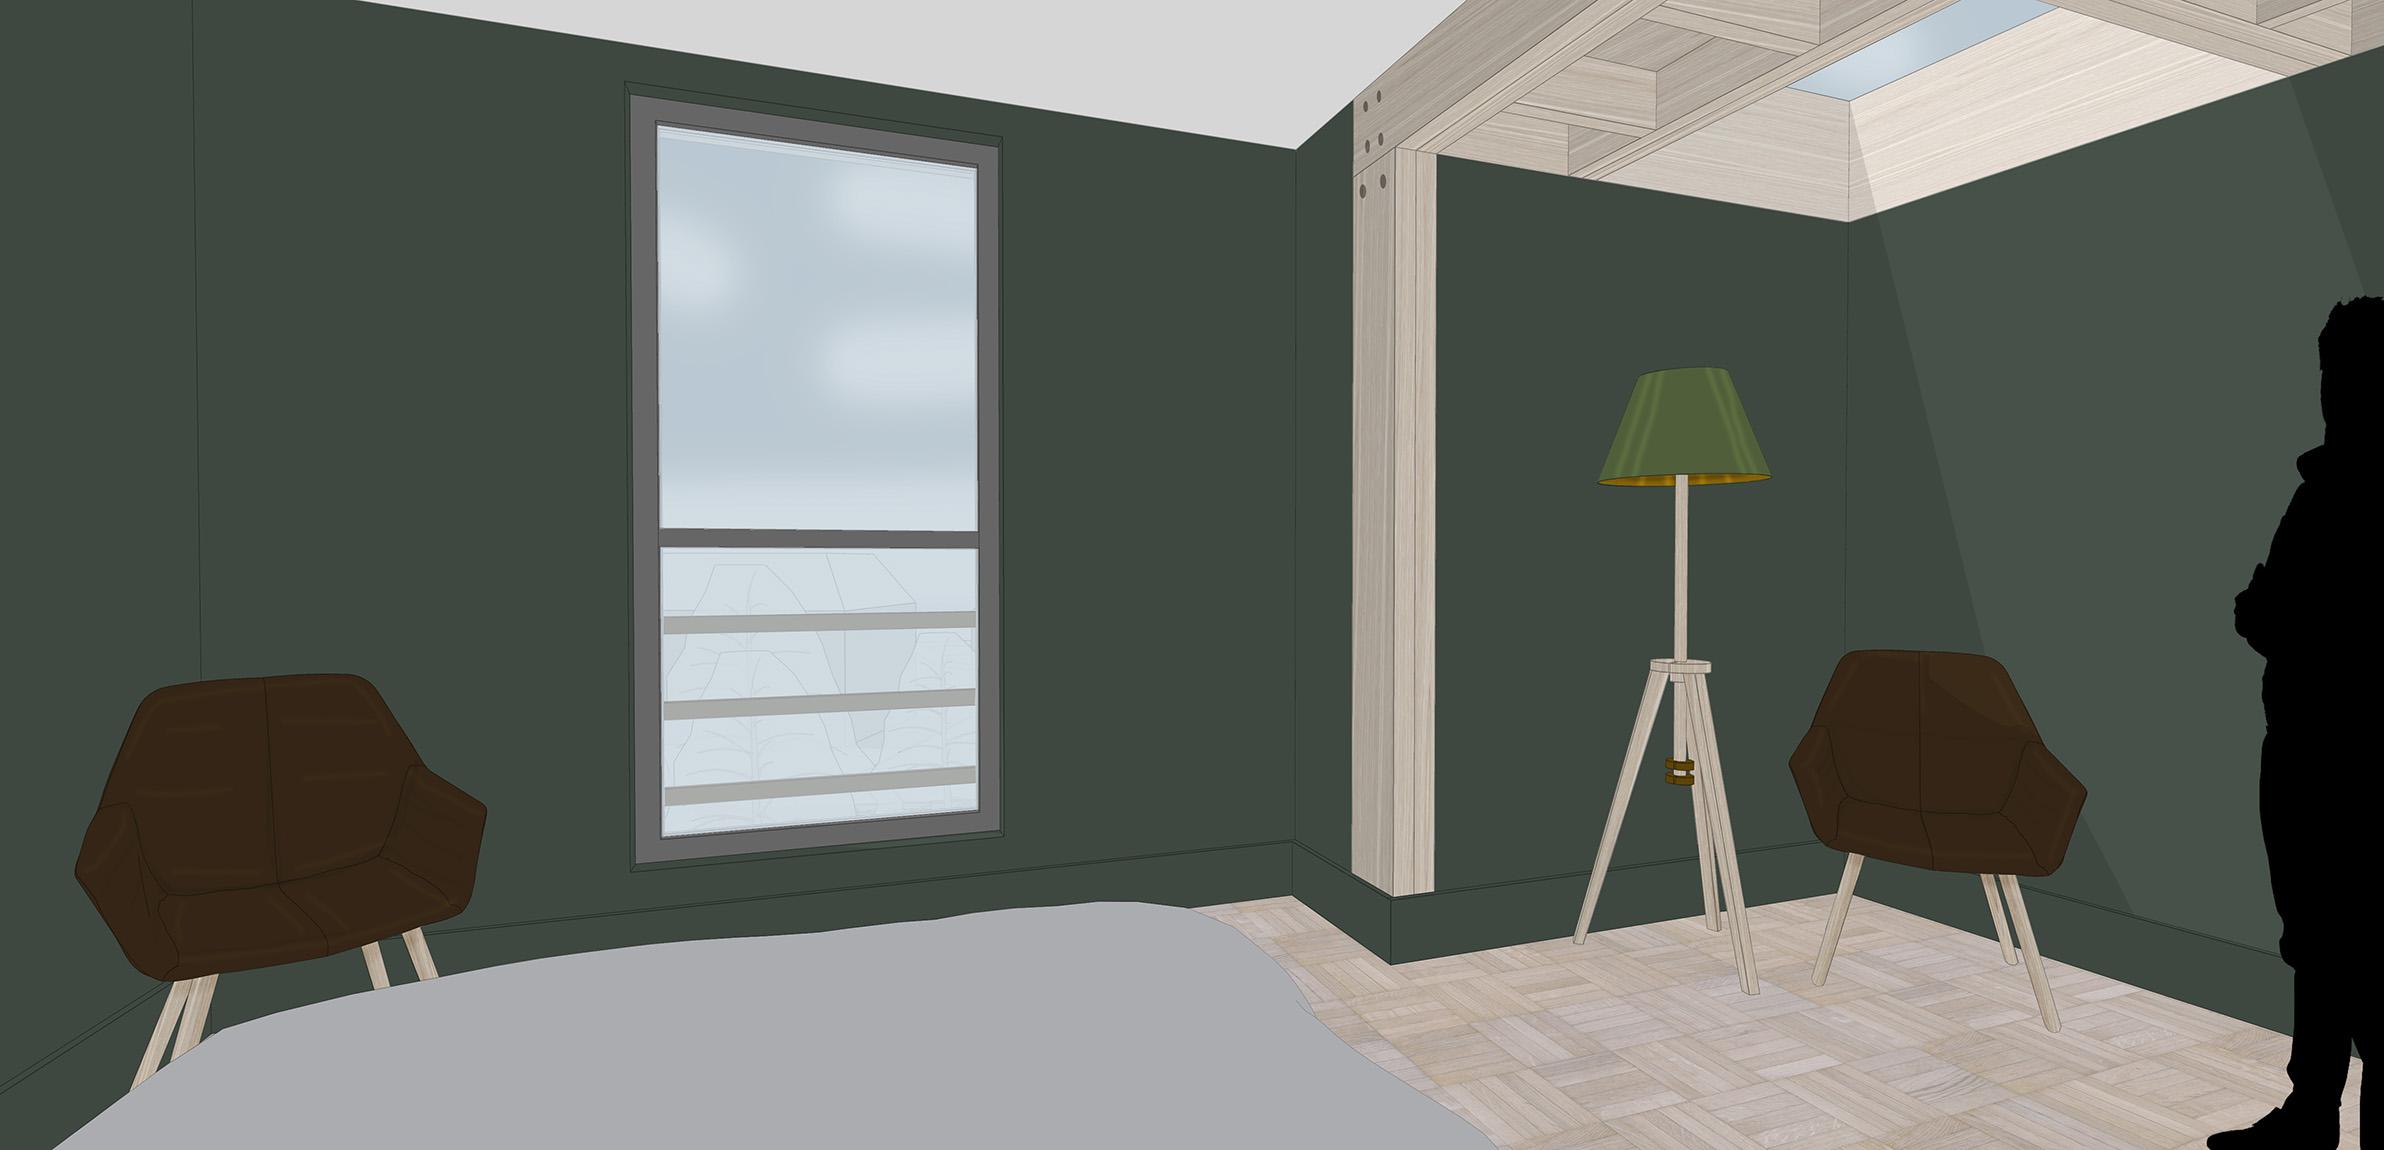 Revised dormer - interior